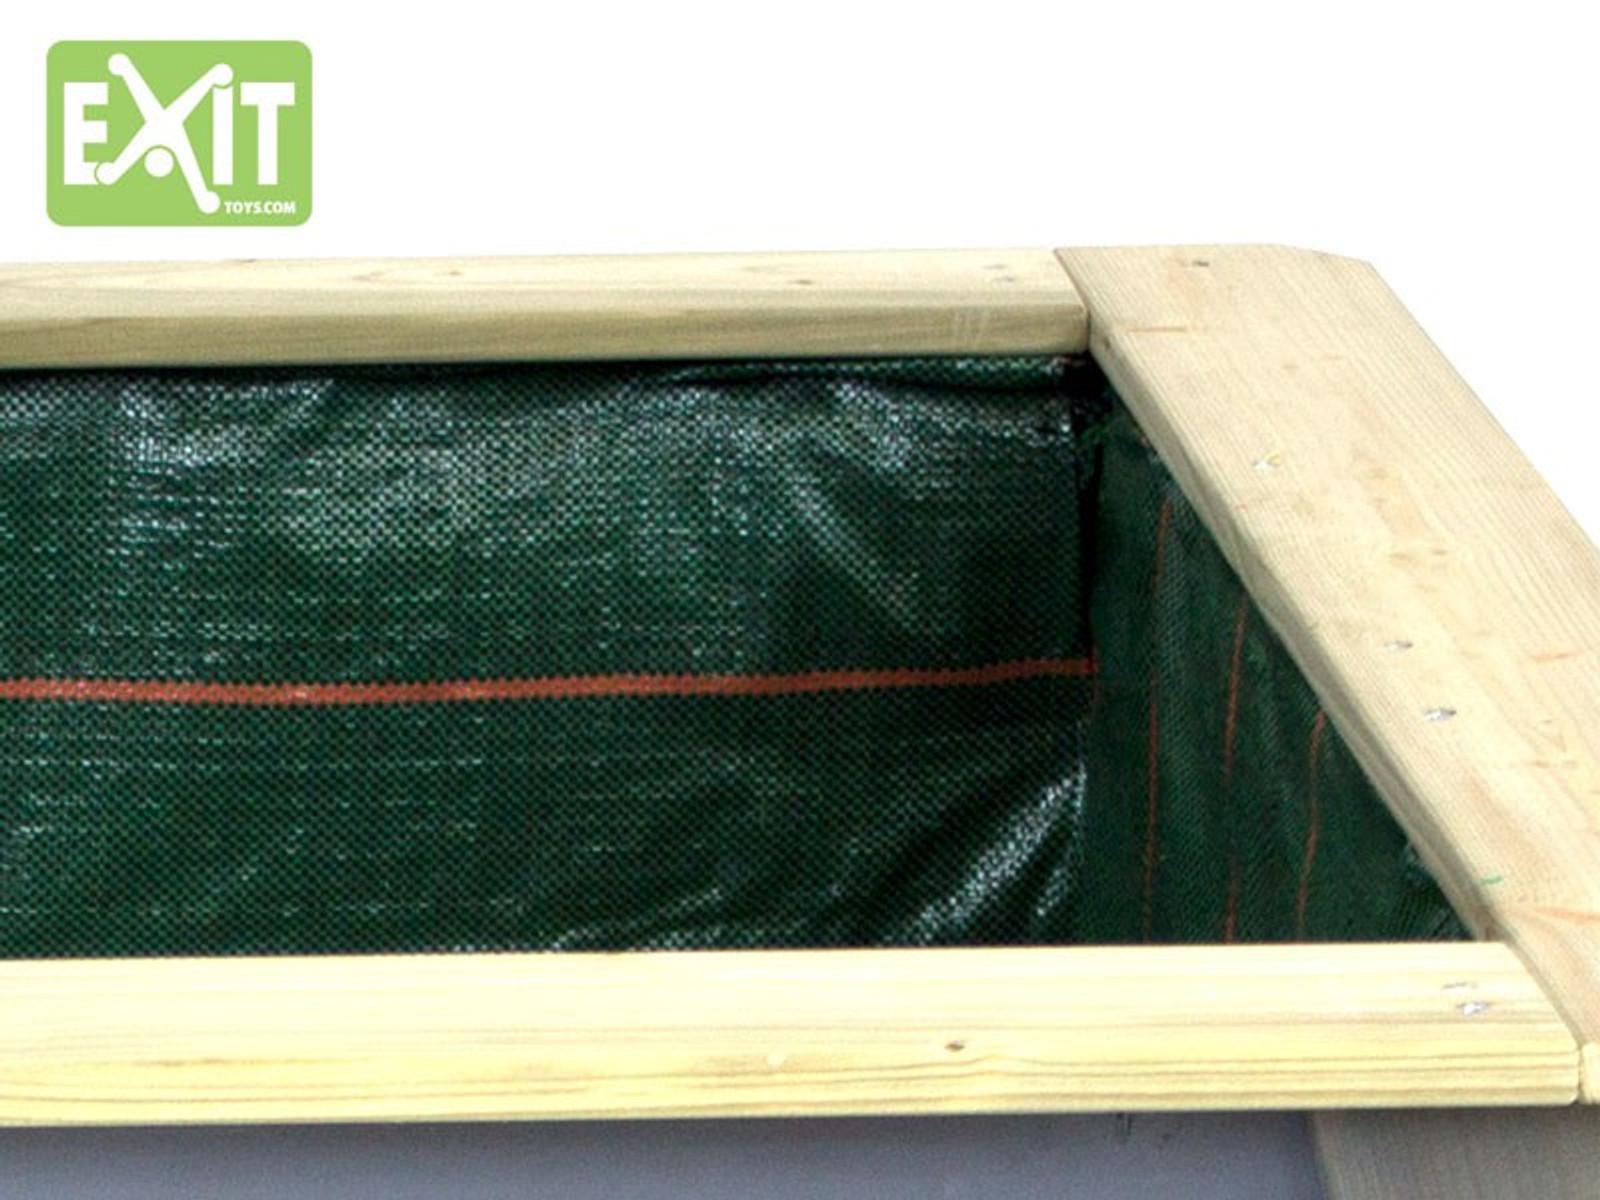 Exit Aksent Hochbeet L Material Nordisches Fichtenholz Masse 93